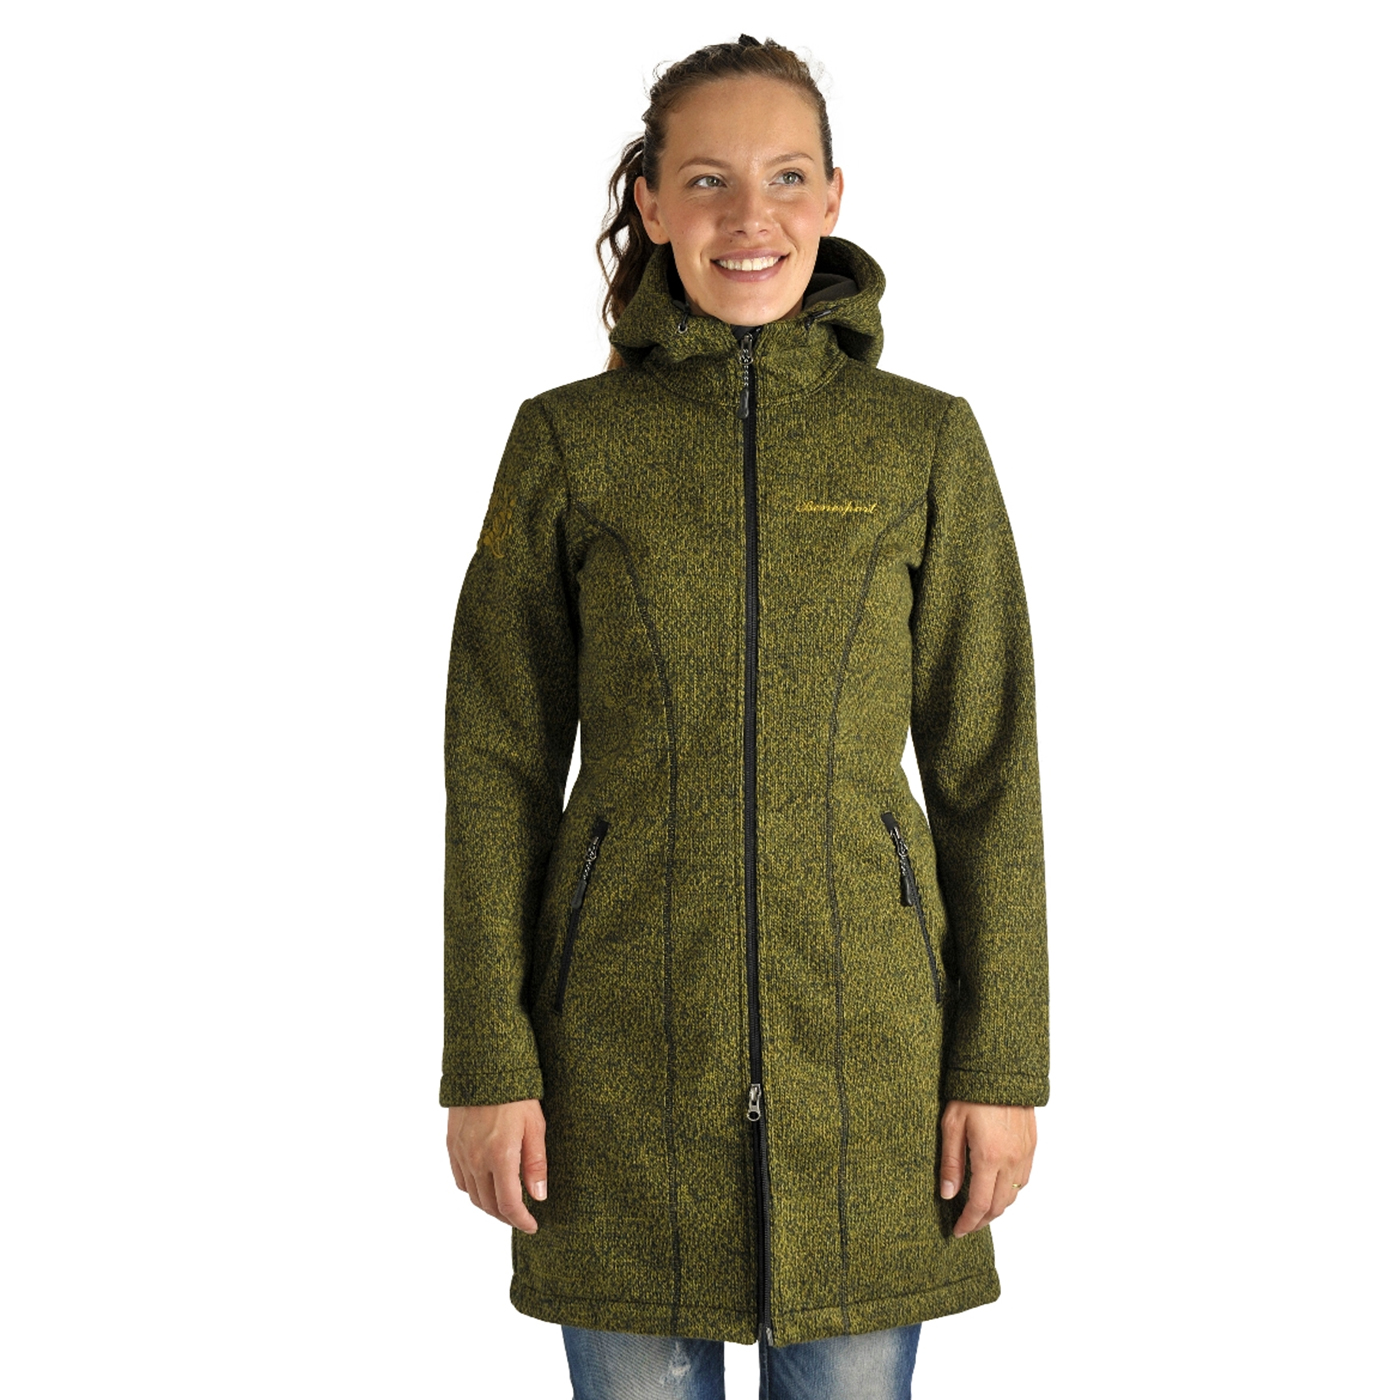 Benesport dámska bunda Pekelník - zelená, veľkosť L